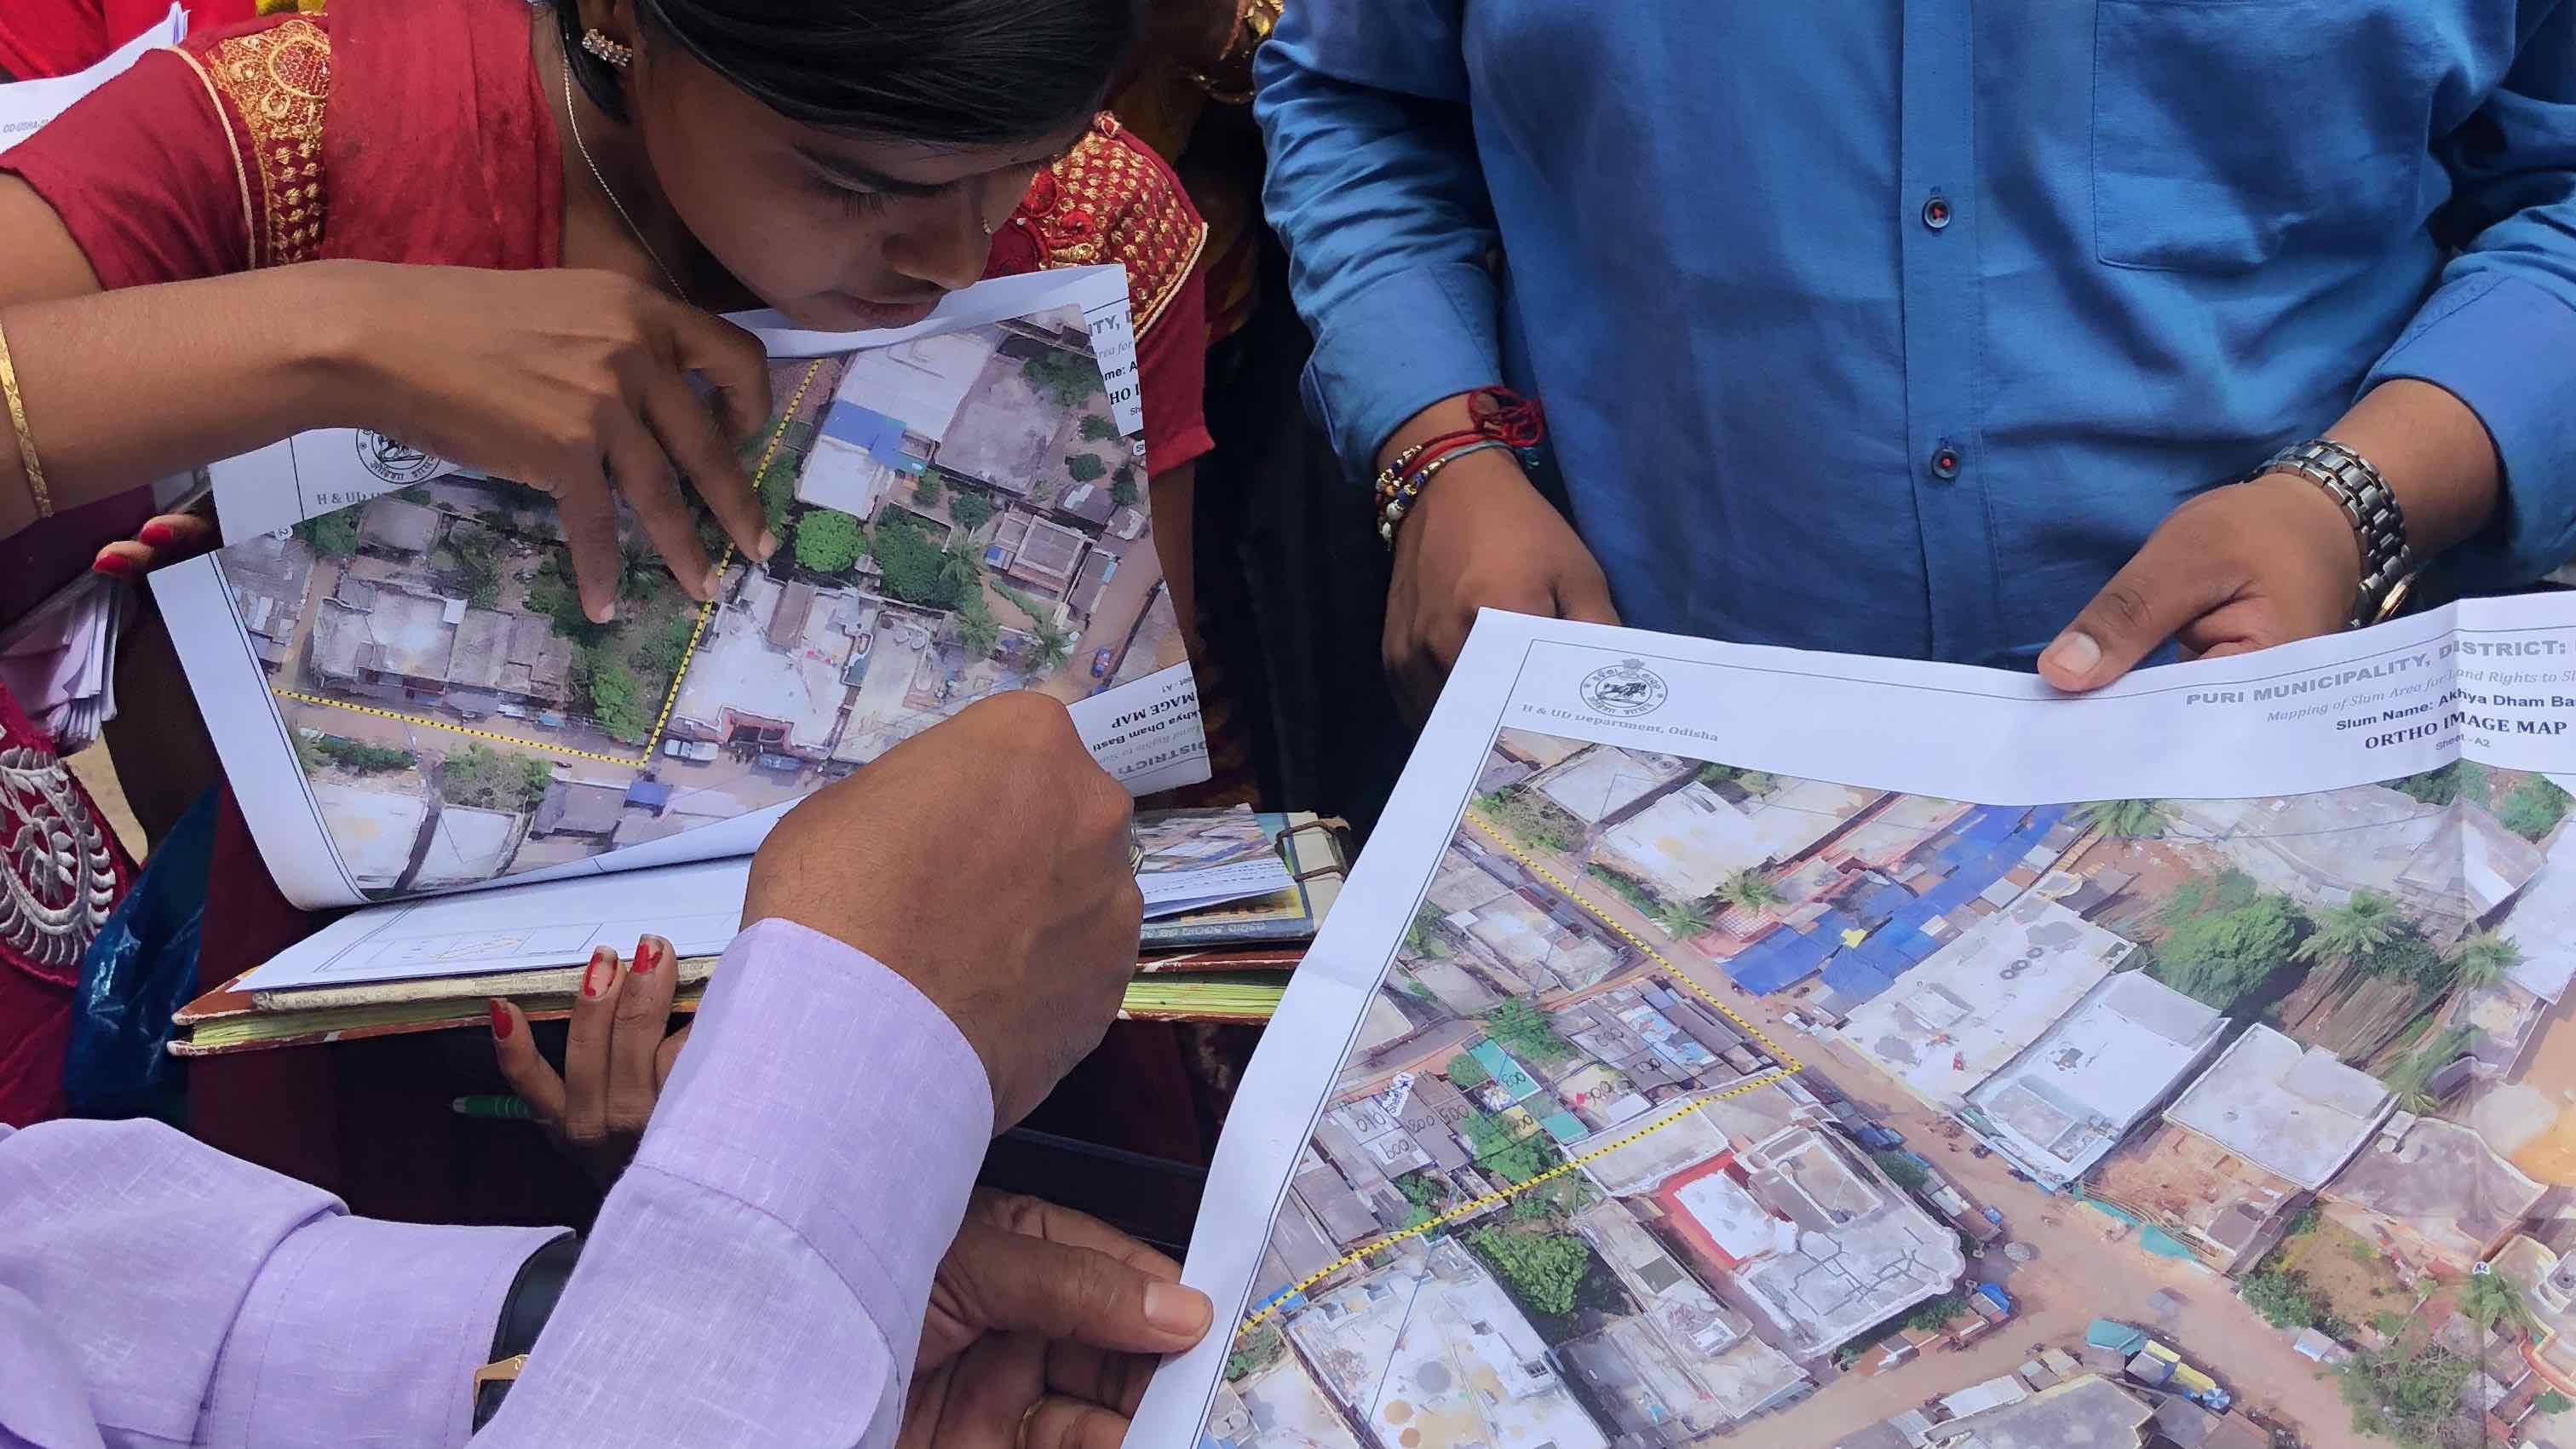 paper maps shared among neighbors